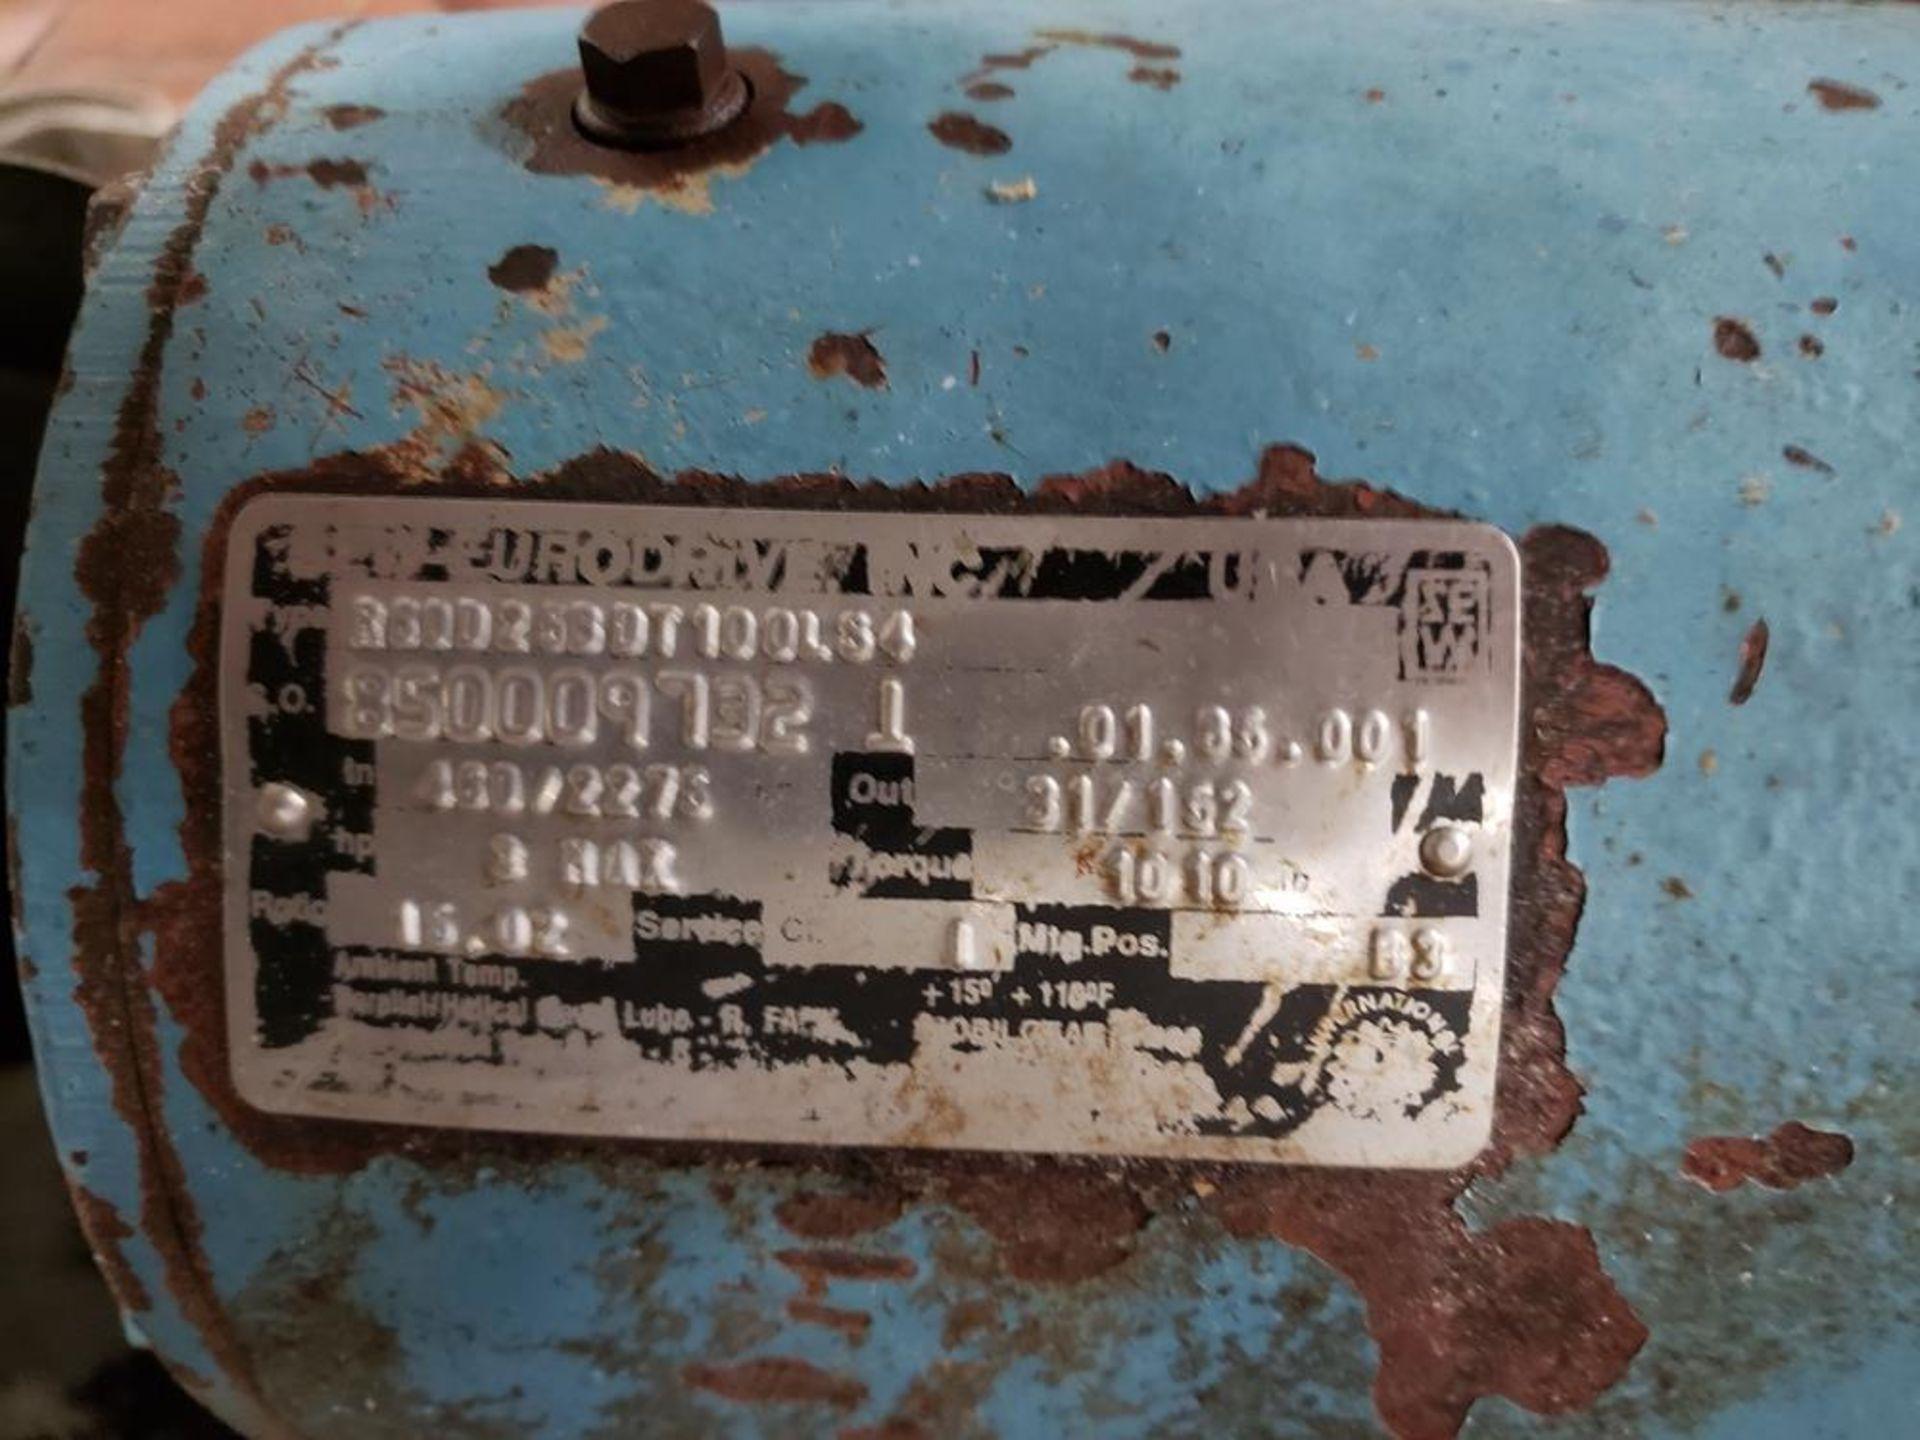 Lot 44 - Waukesha M# 130 Positive Displacement Pump Skid, S/N 102531 | Subj to Bulk | Rig Fee: $125